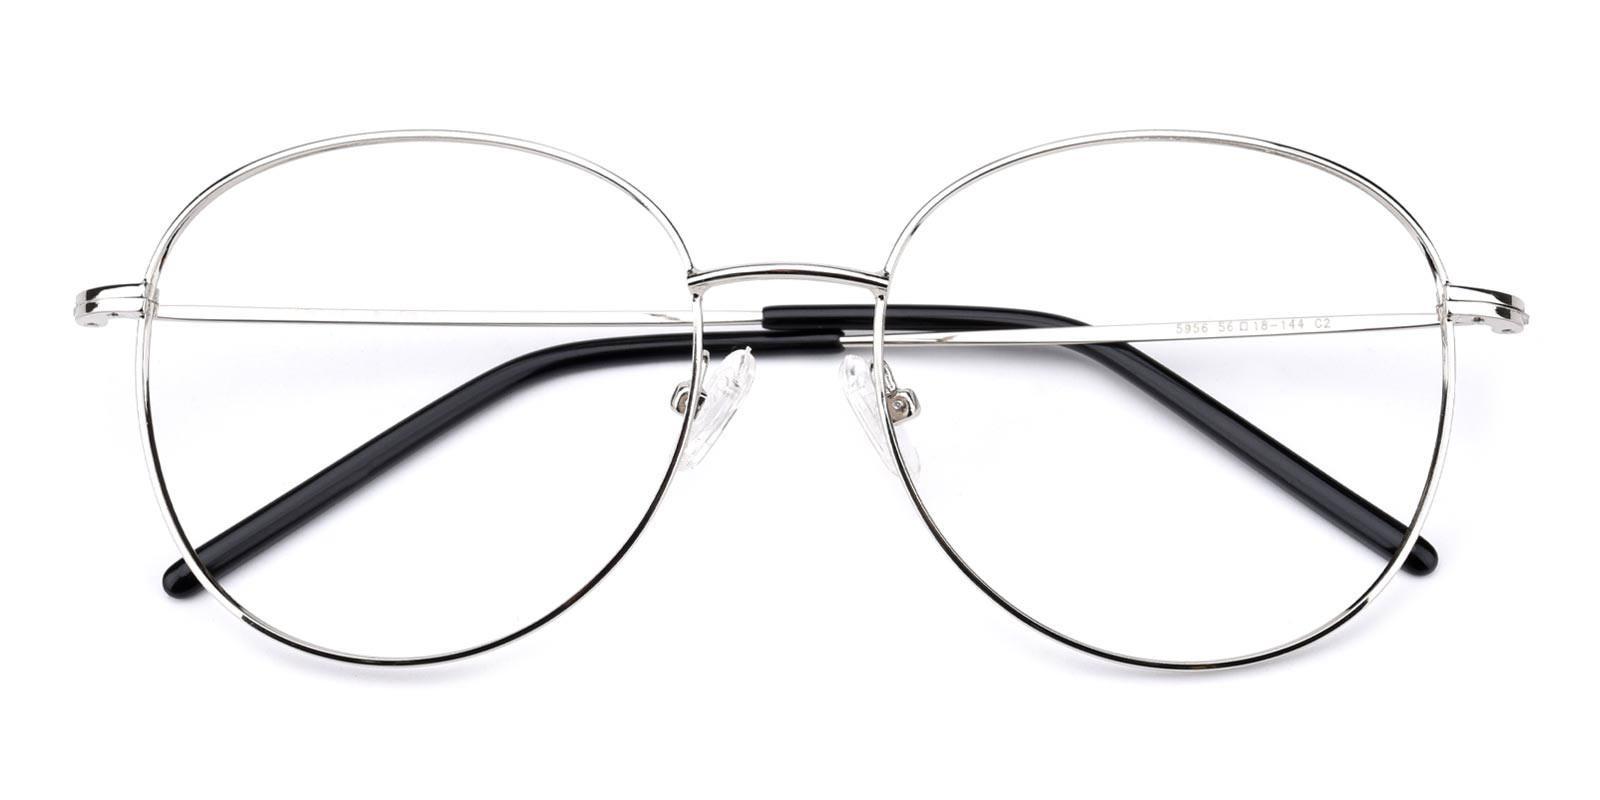 Damla-Silver-Round-Metal-Eyeglasses-detail